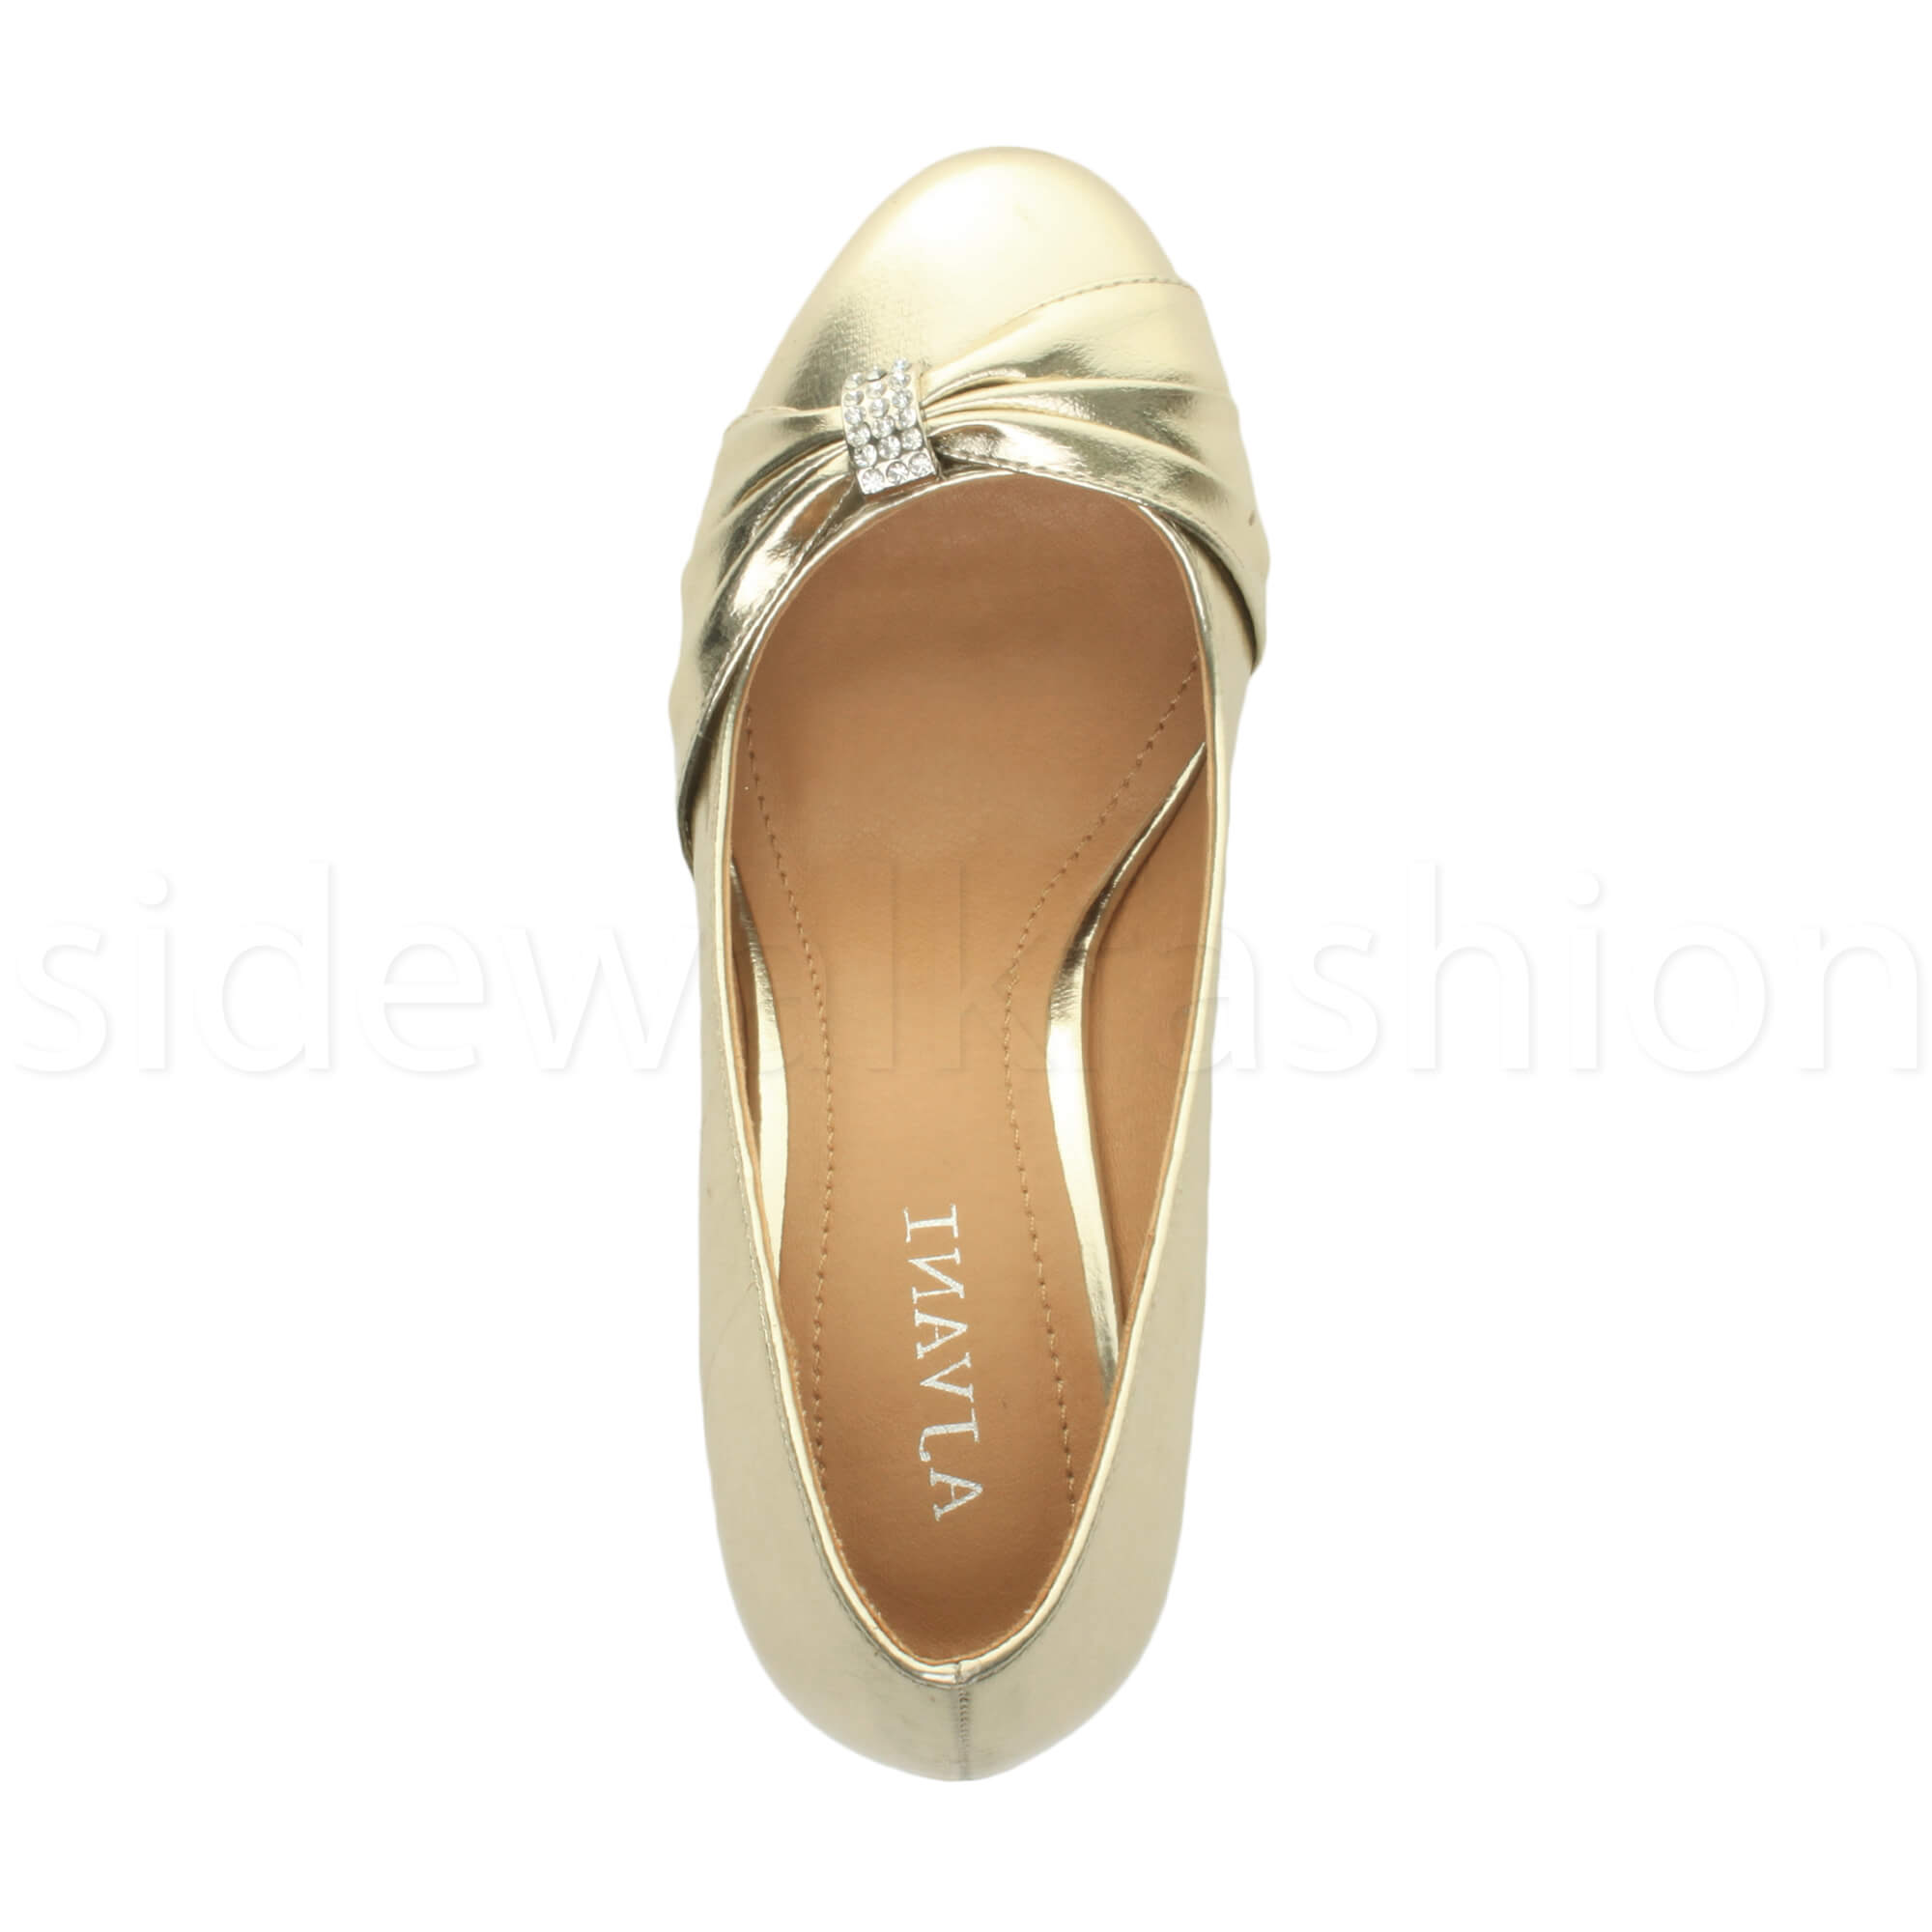 Womens-ladies-low-mid-heel-diamante-party-smart-evening-court-shoes-size thumbnail 32